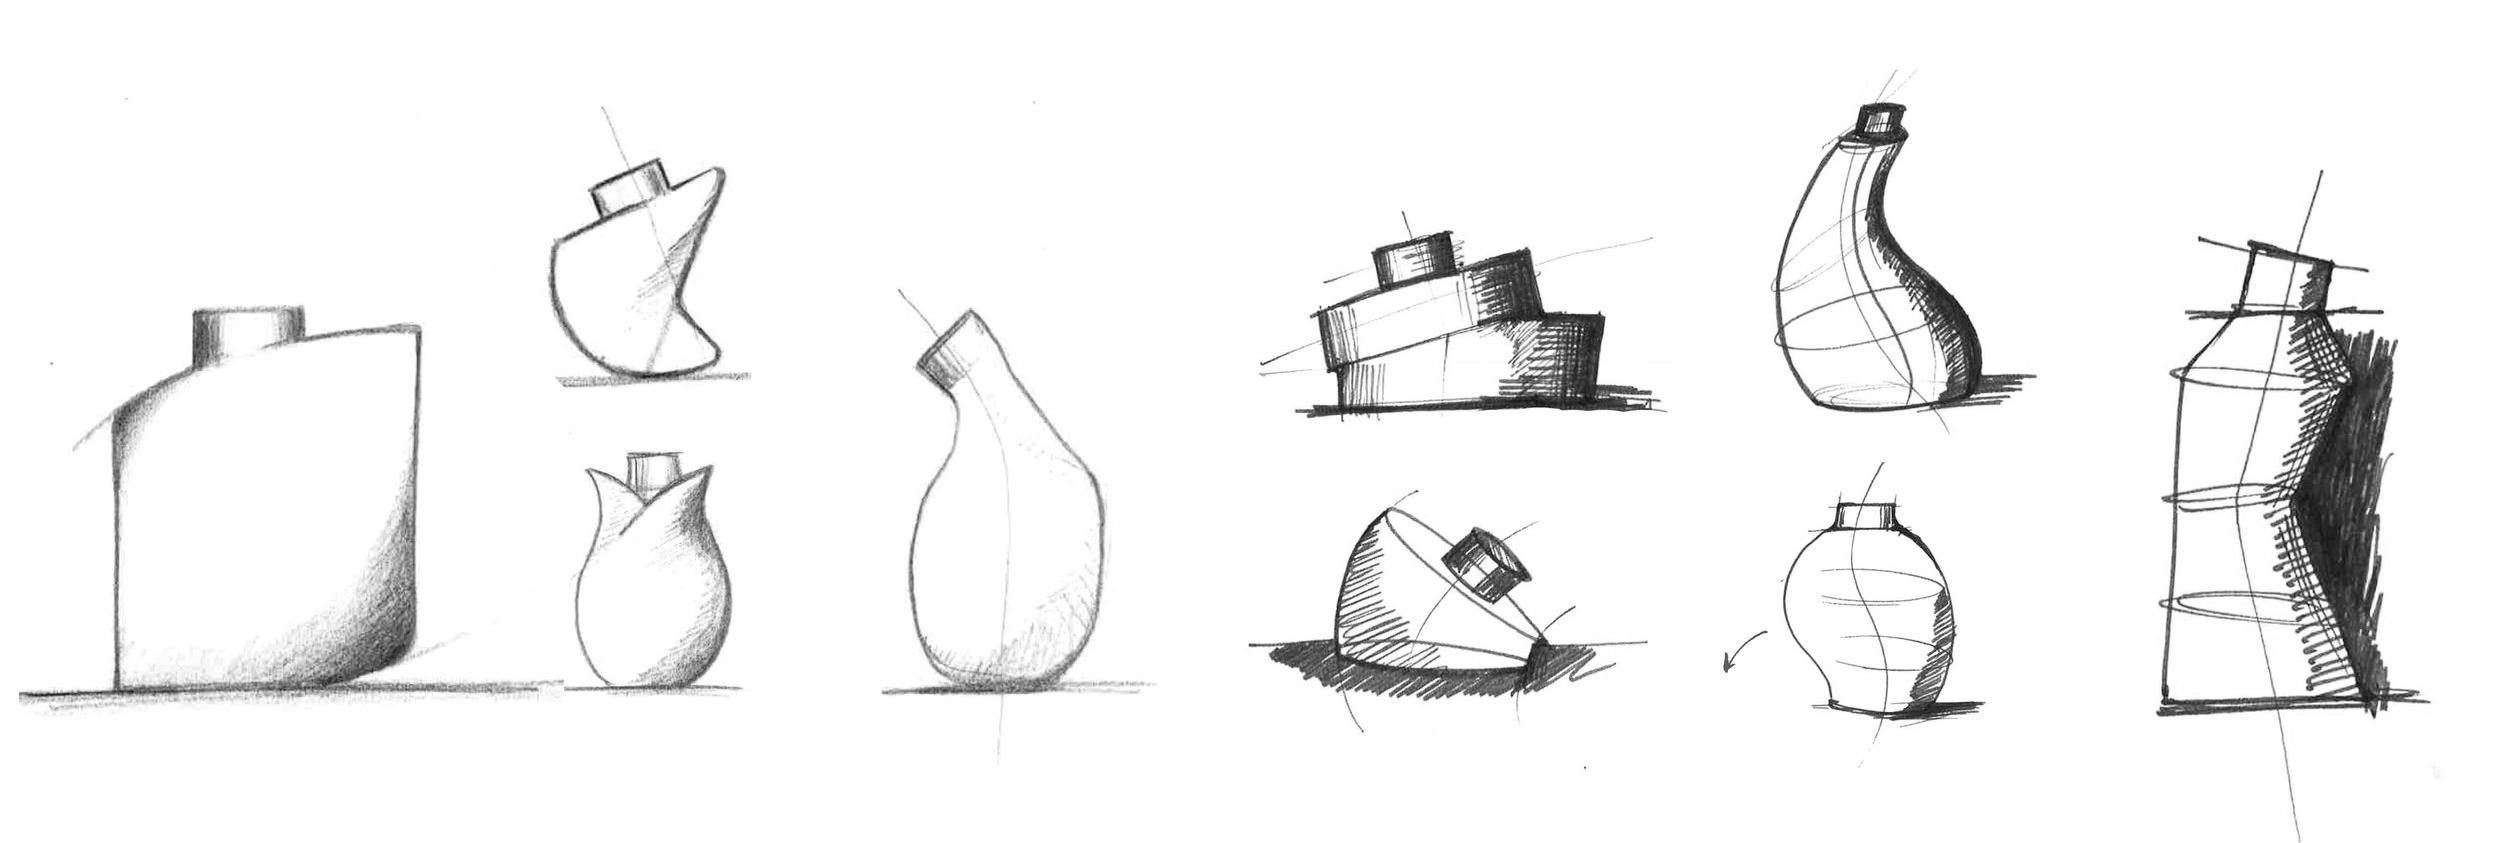 flaska skisser.jpg